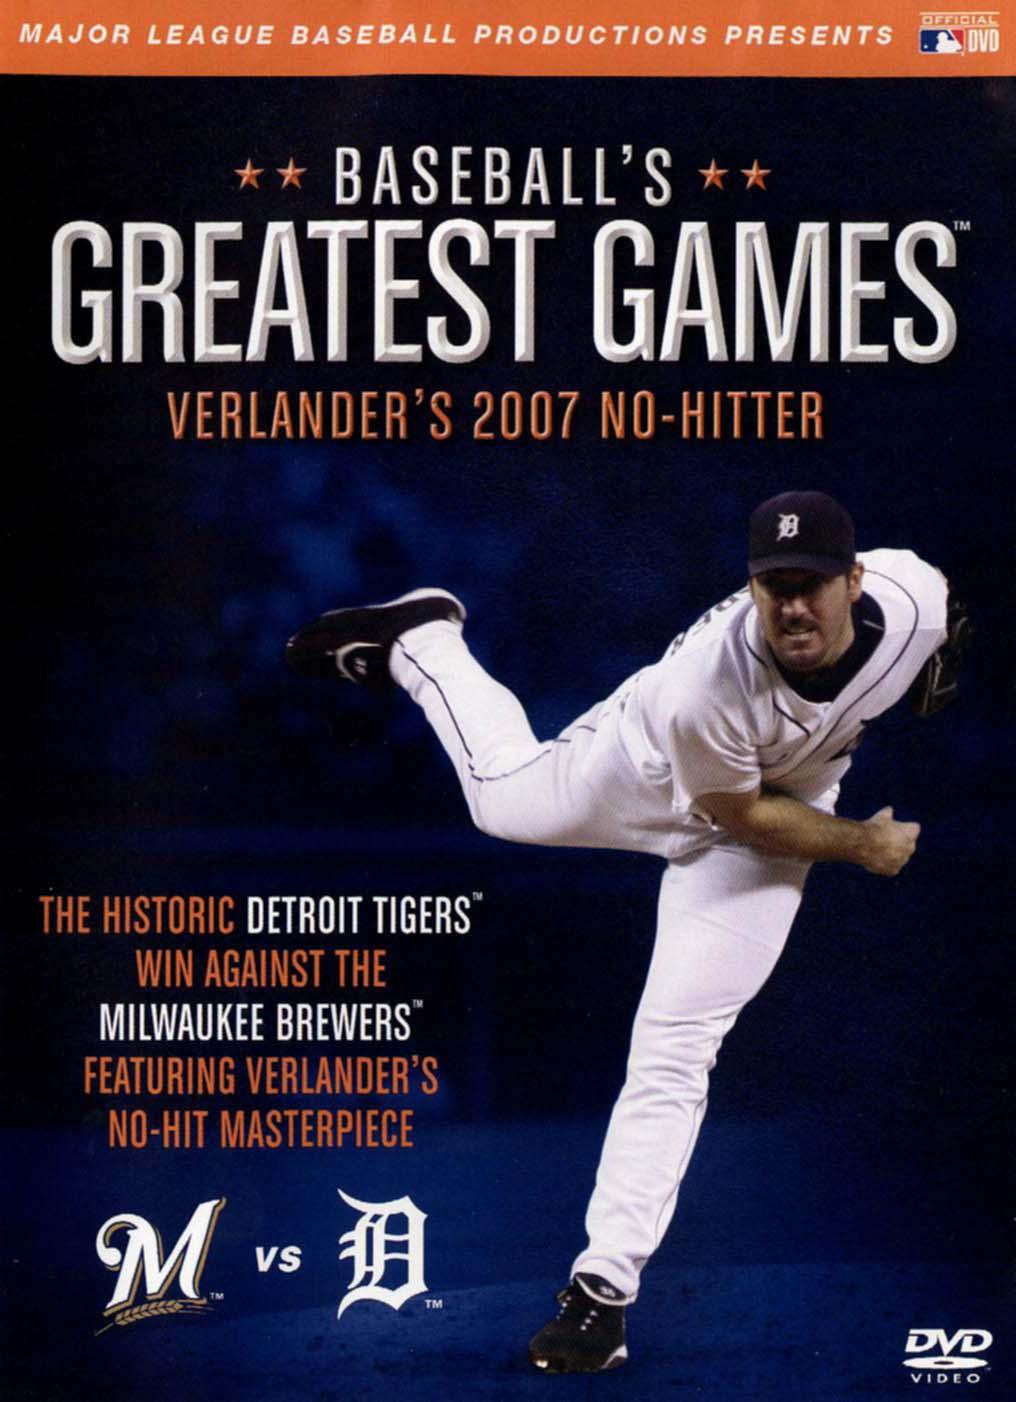 MLB: Baseball's Greatest Games - Verlander's 2007 No-Hitter